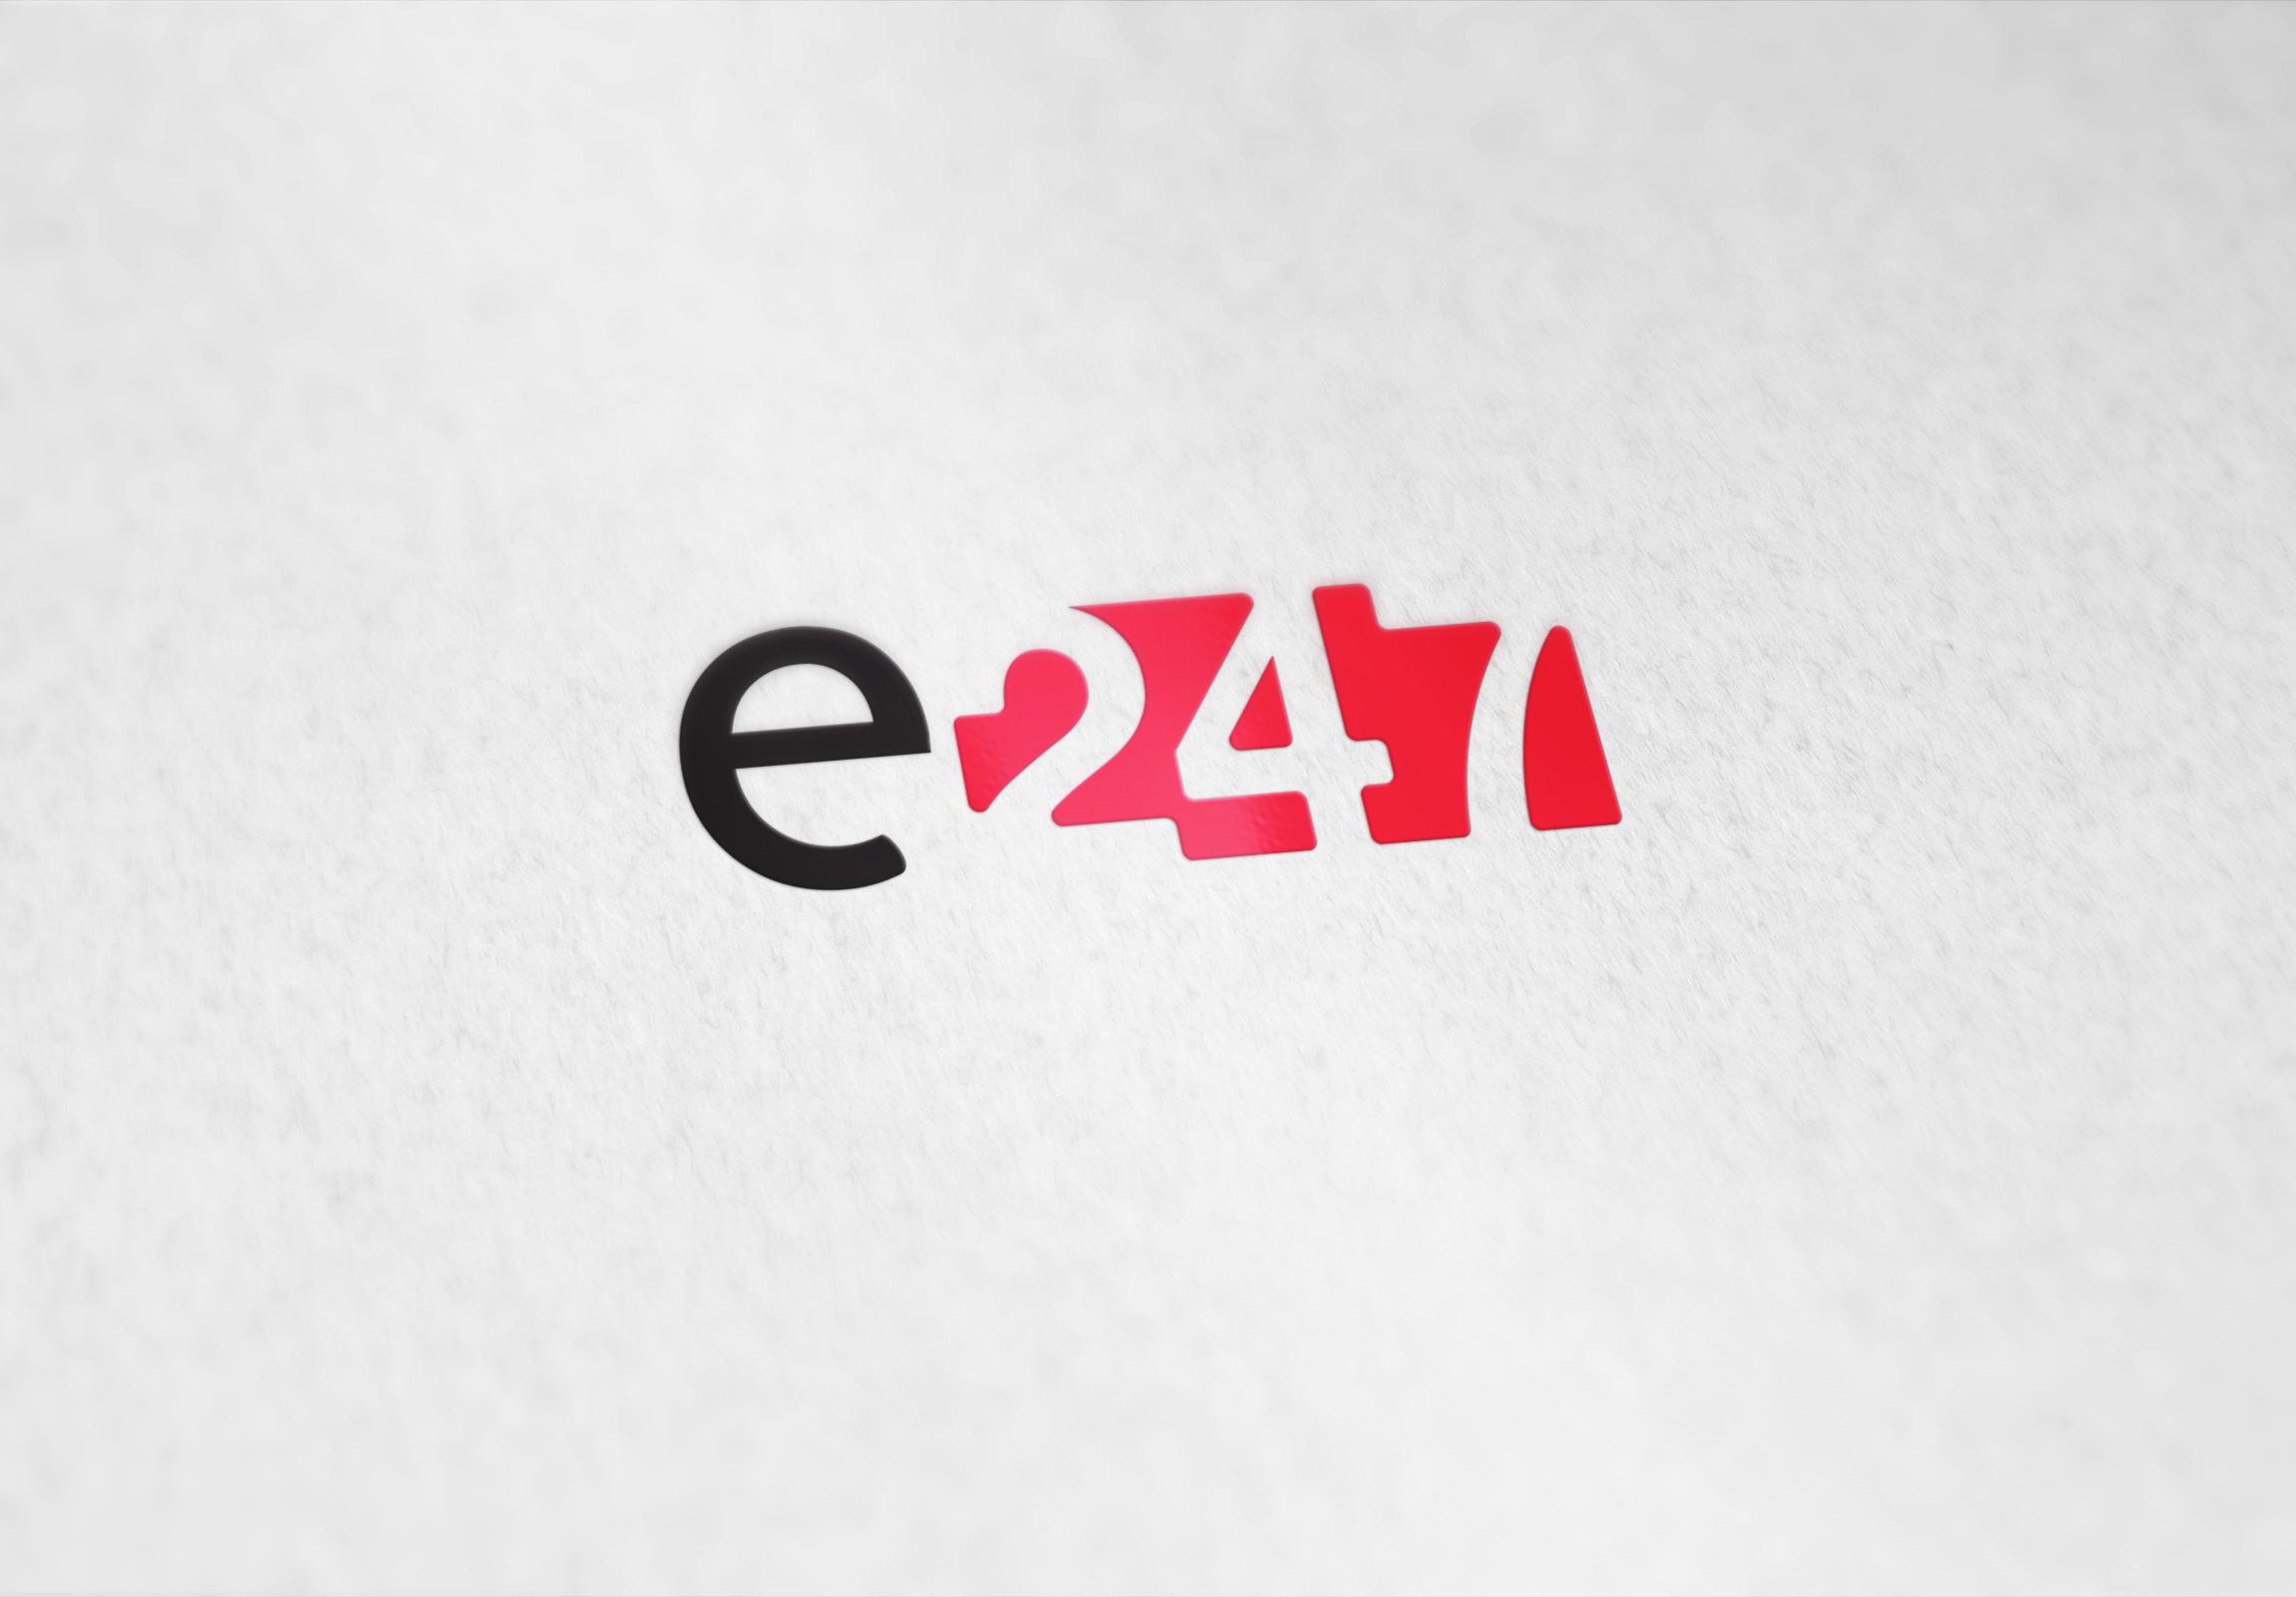 Bandungdesign Jasa Logo Company Profile Website Animasi Lengkap Belajar Desain Grafis Dan Multimedia E247